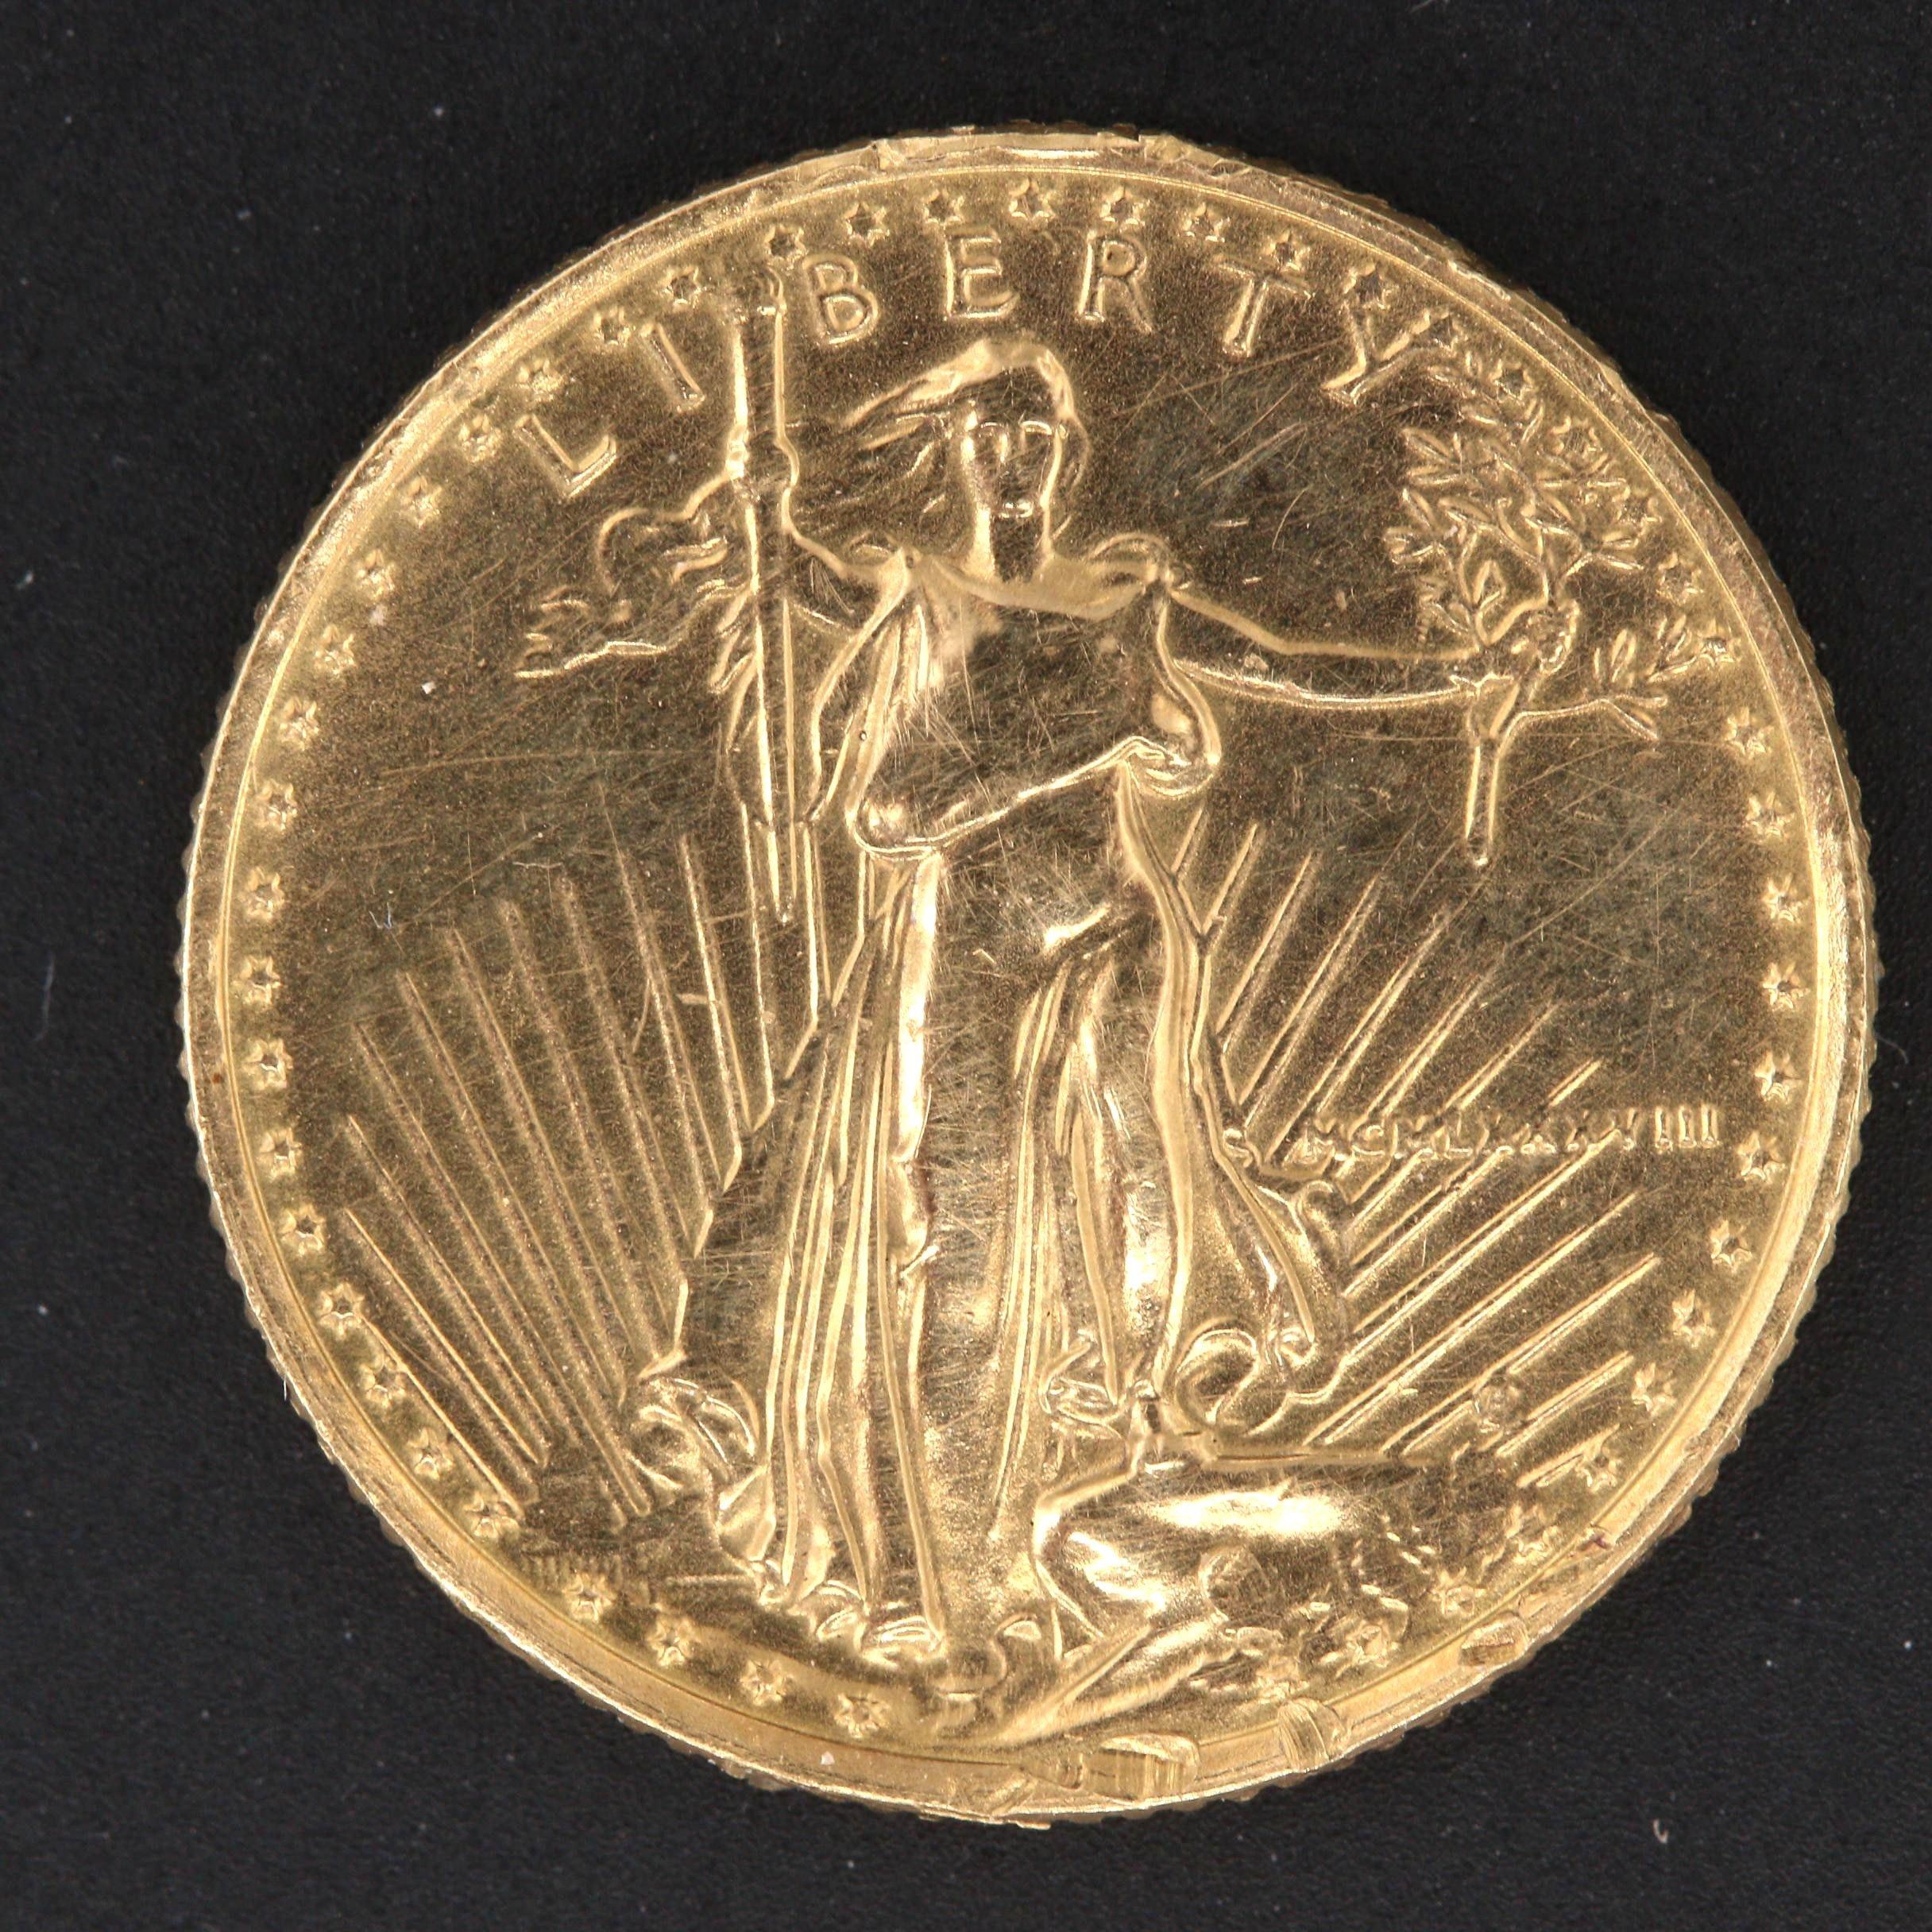 1988 $5 Tenth-Ounce Gold American Gold Eagle Bullion Coin